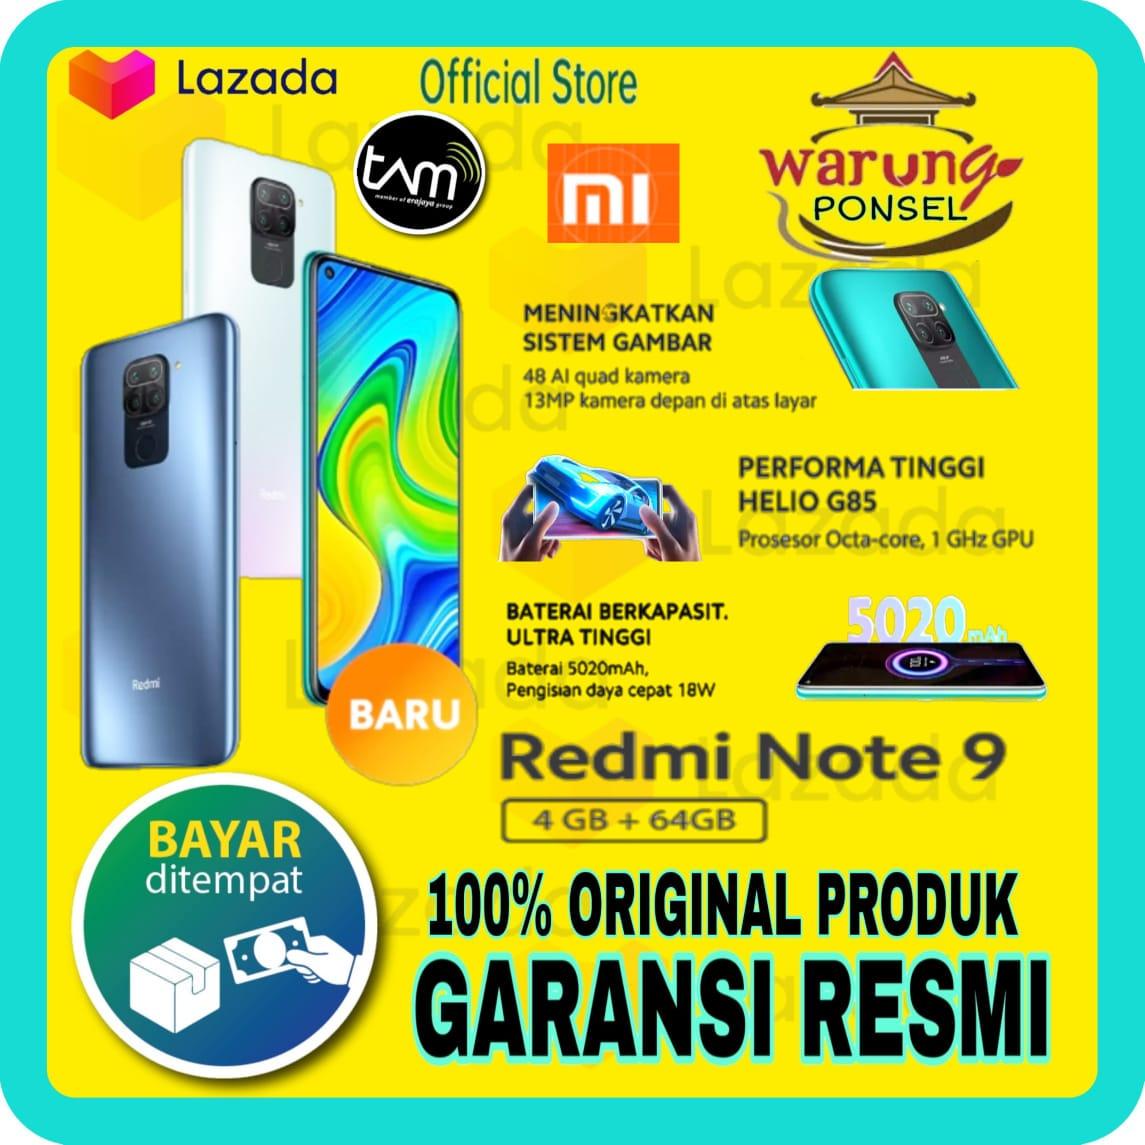 Redmi Note 9 (4GB+64GB) Helio G85 48MP Quad Kamera 5020mAh 6.53